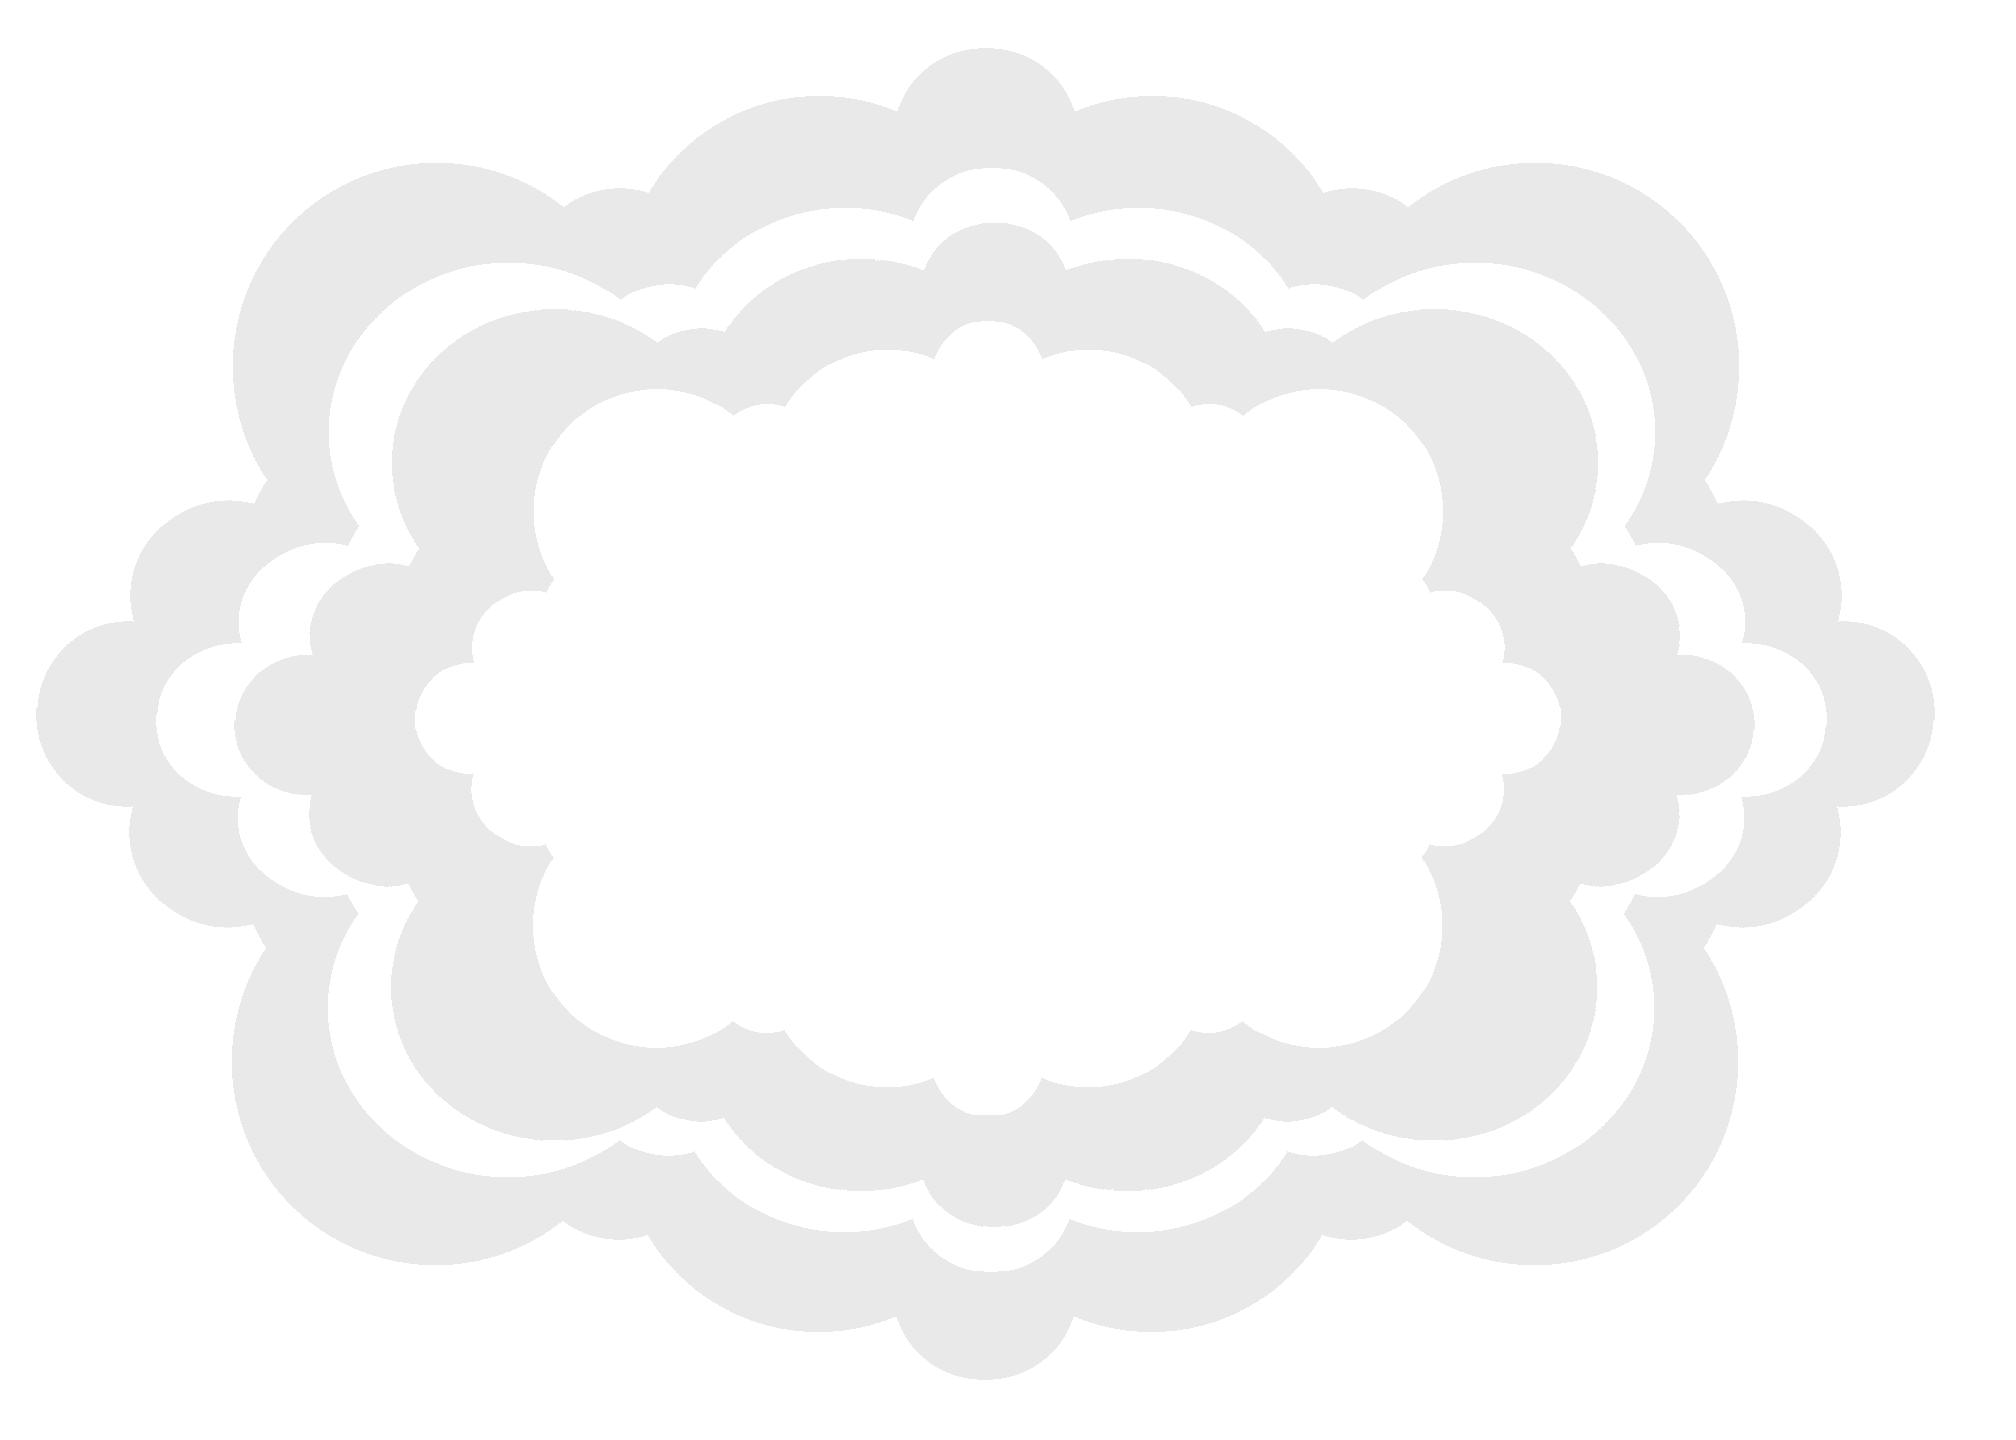 ماسكات للفوتوشوب أقنعه للتصميم دانتيل اطارات 3dlat Net 18 15 018b Nome Loja De Roupas Molduras Redondas Logo Loja De Roupas